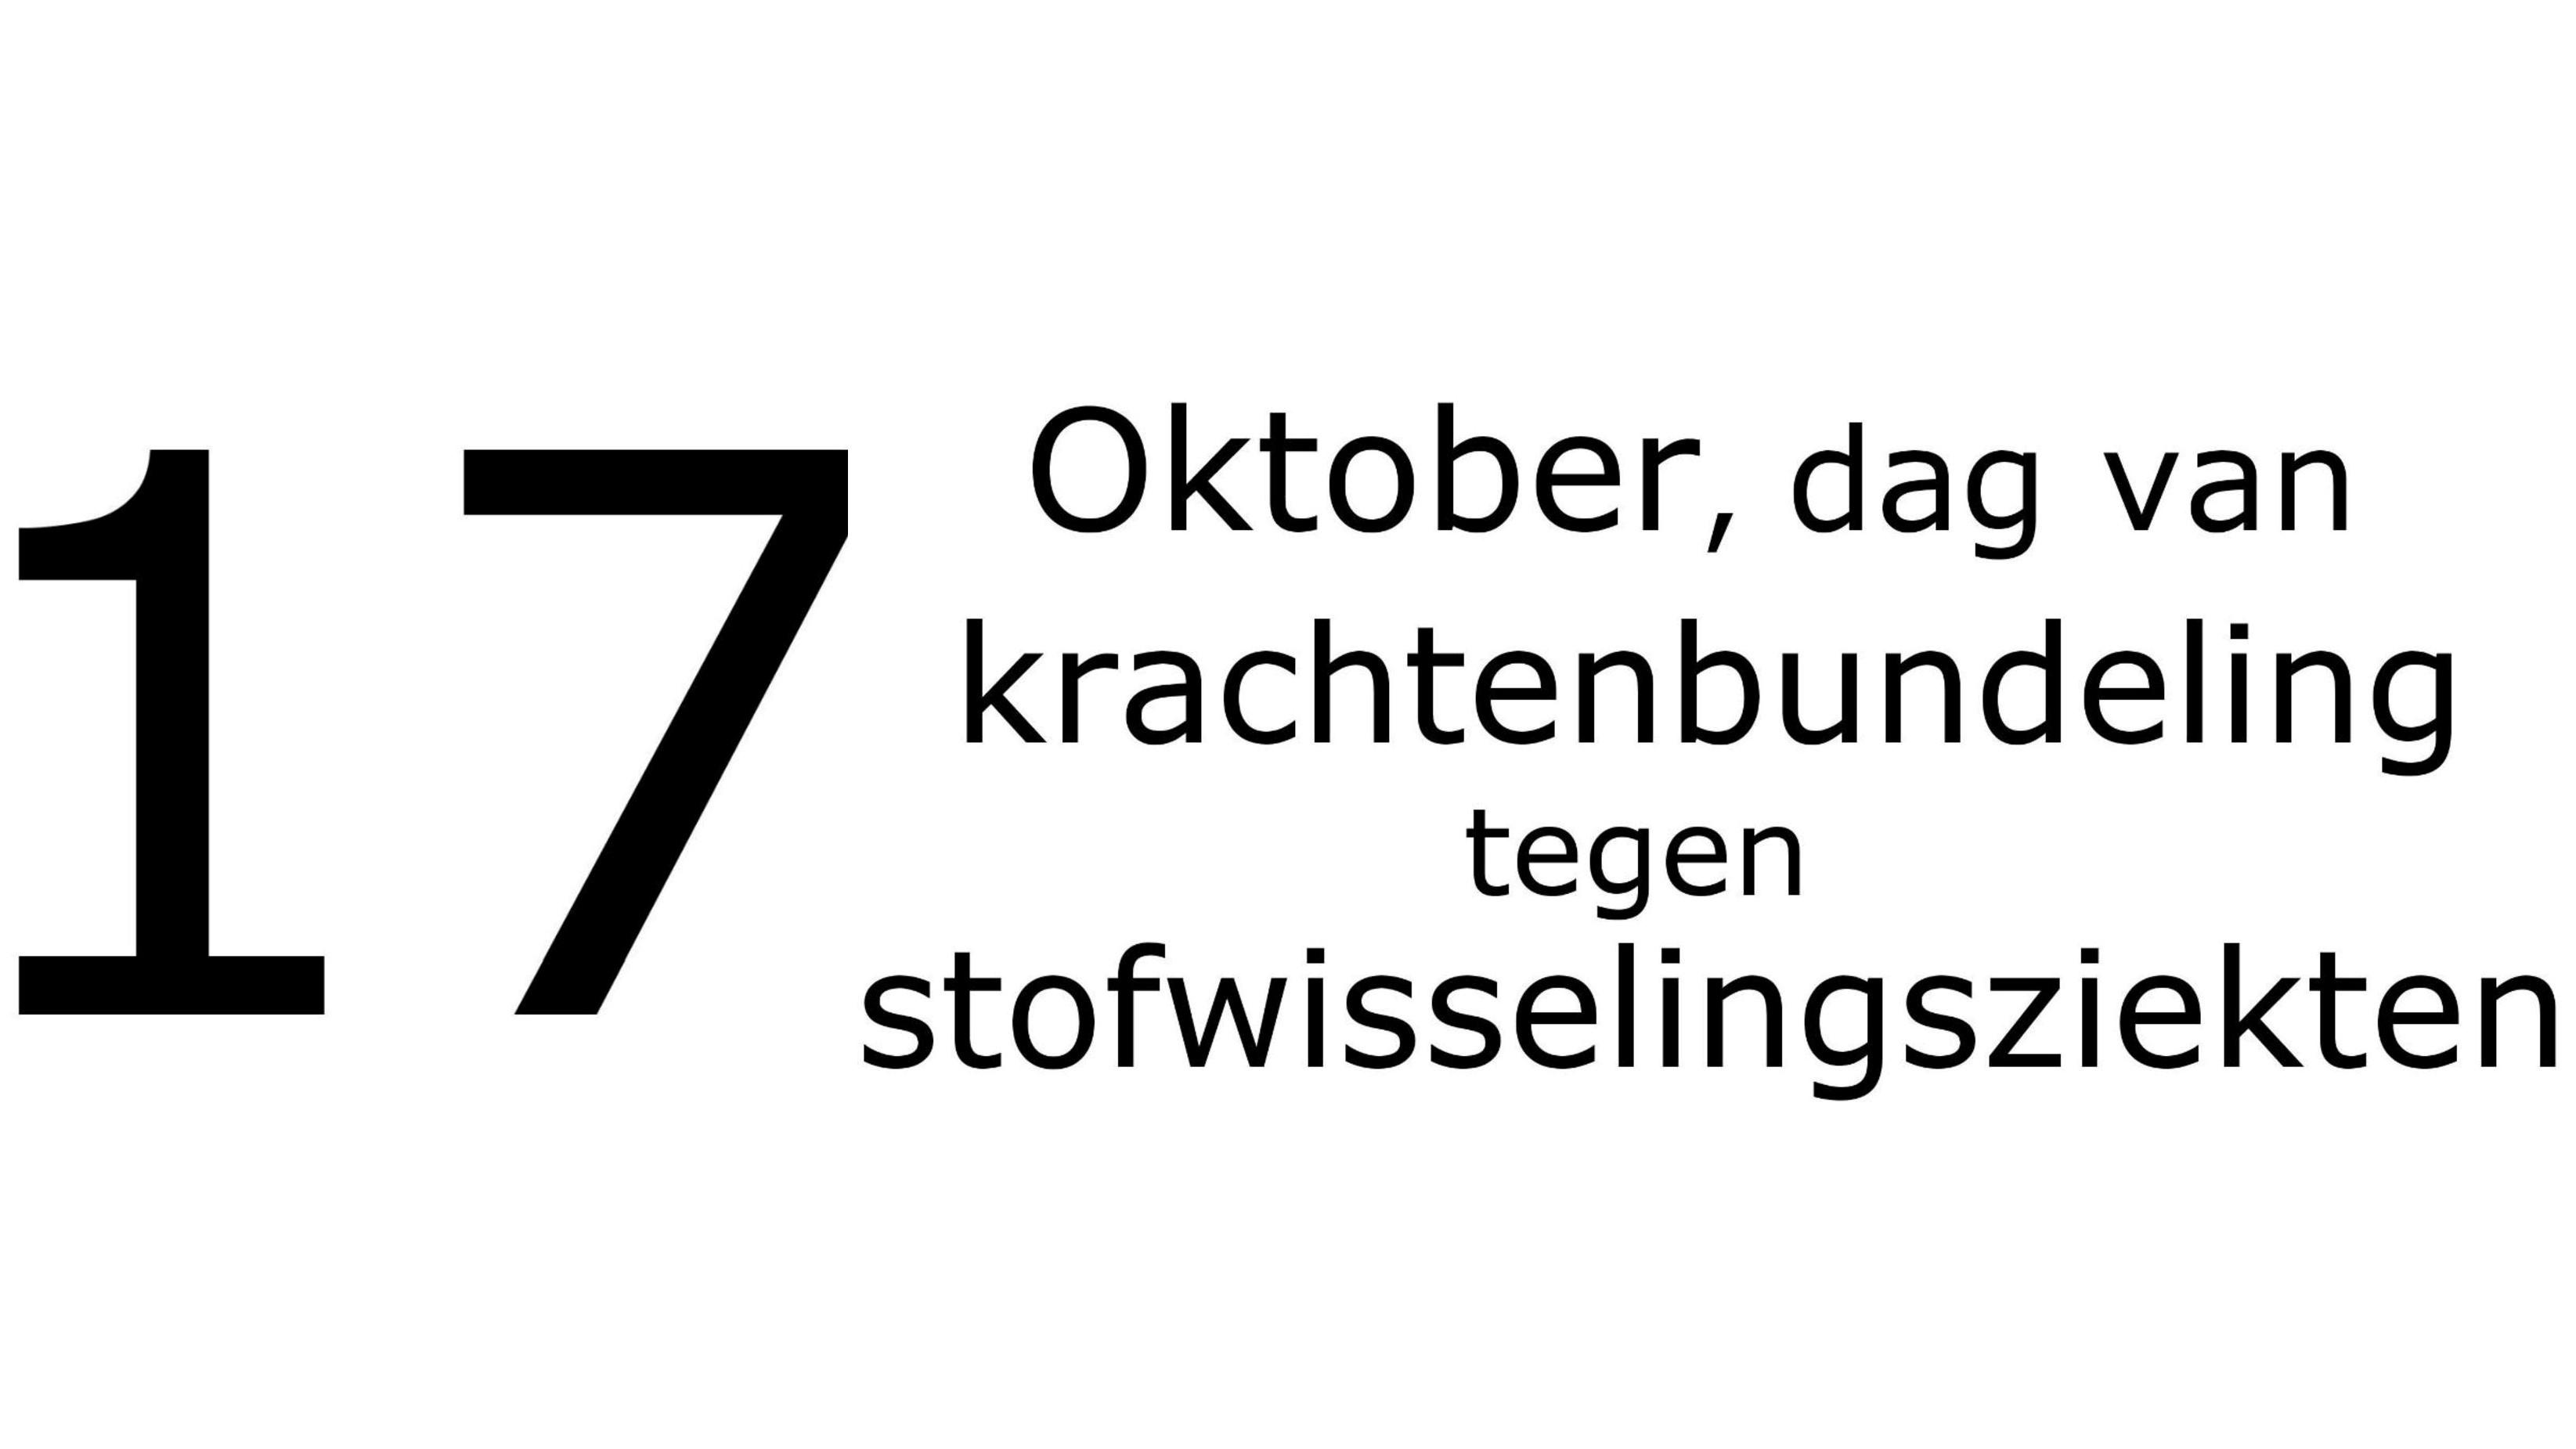 zwart wit logo 17 oktober